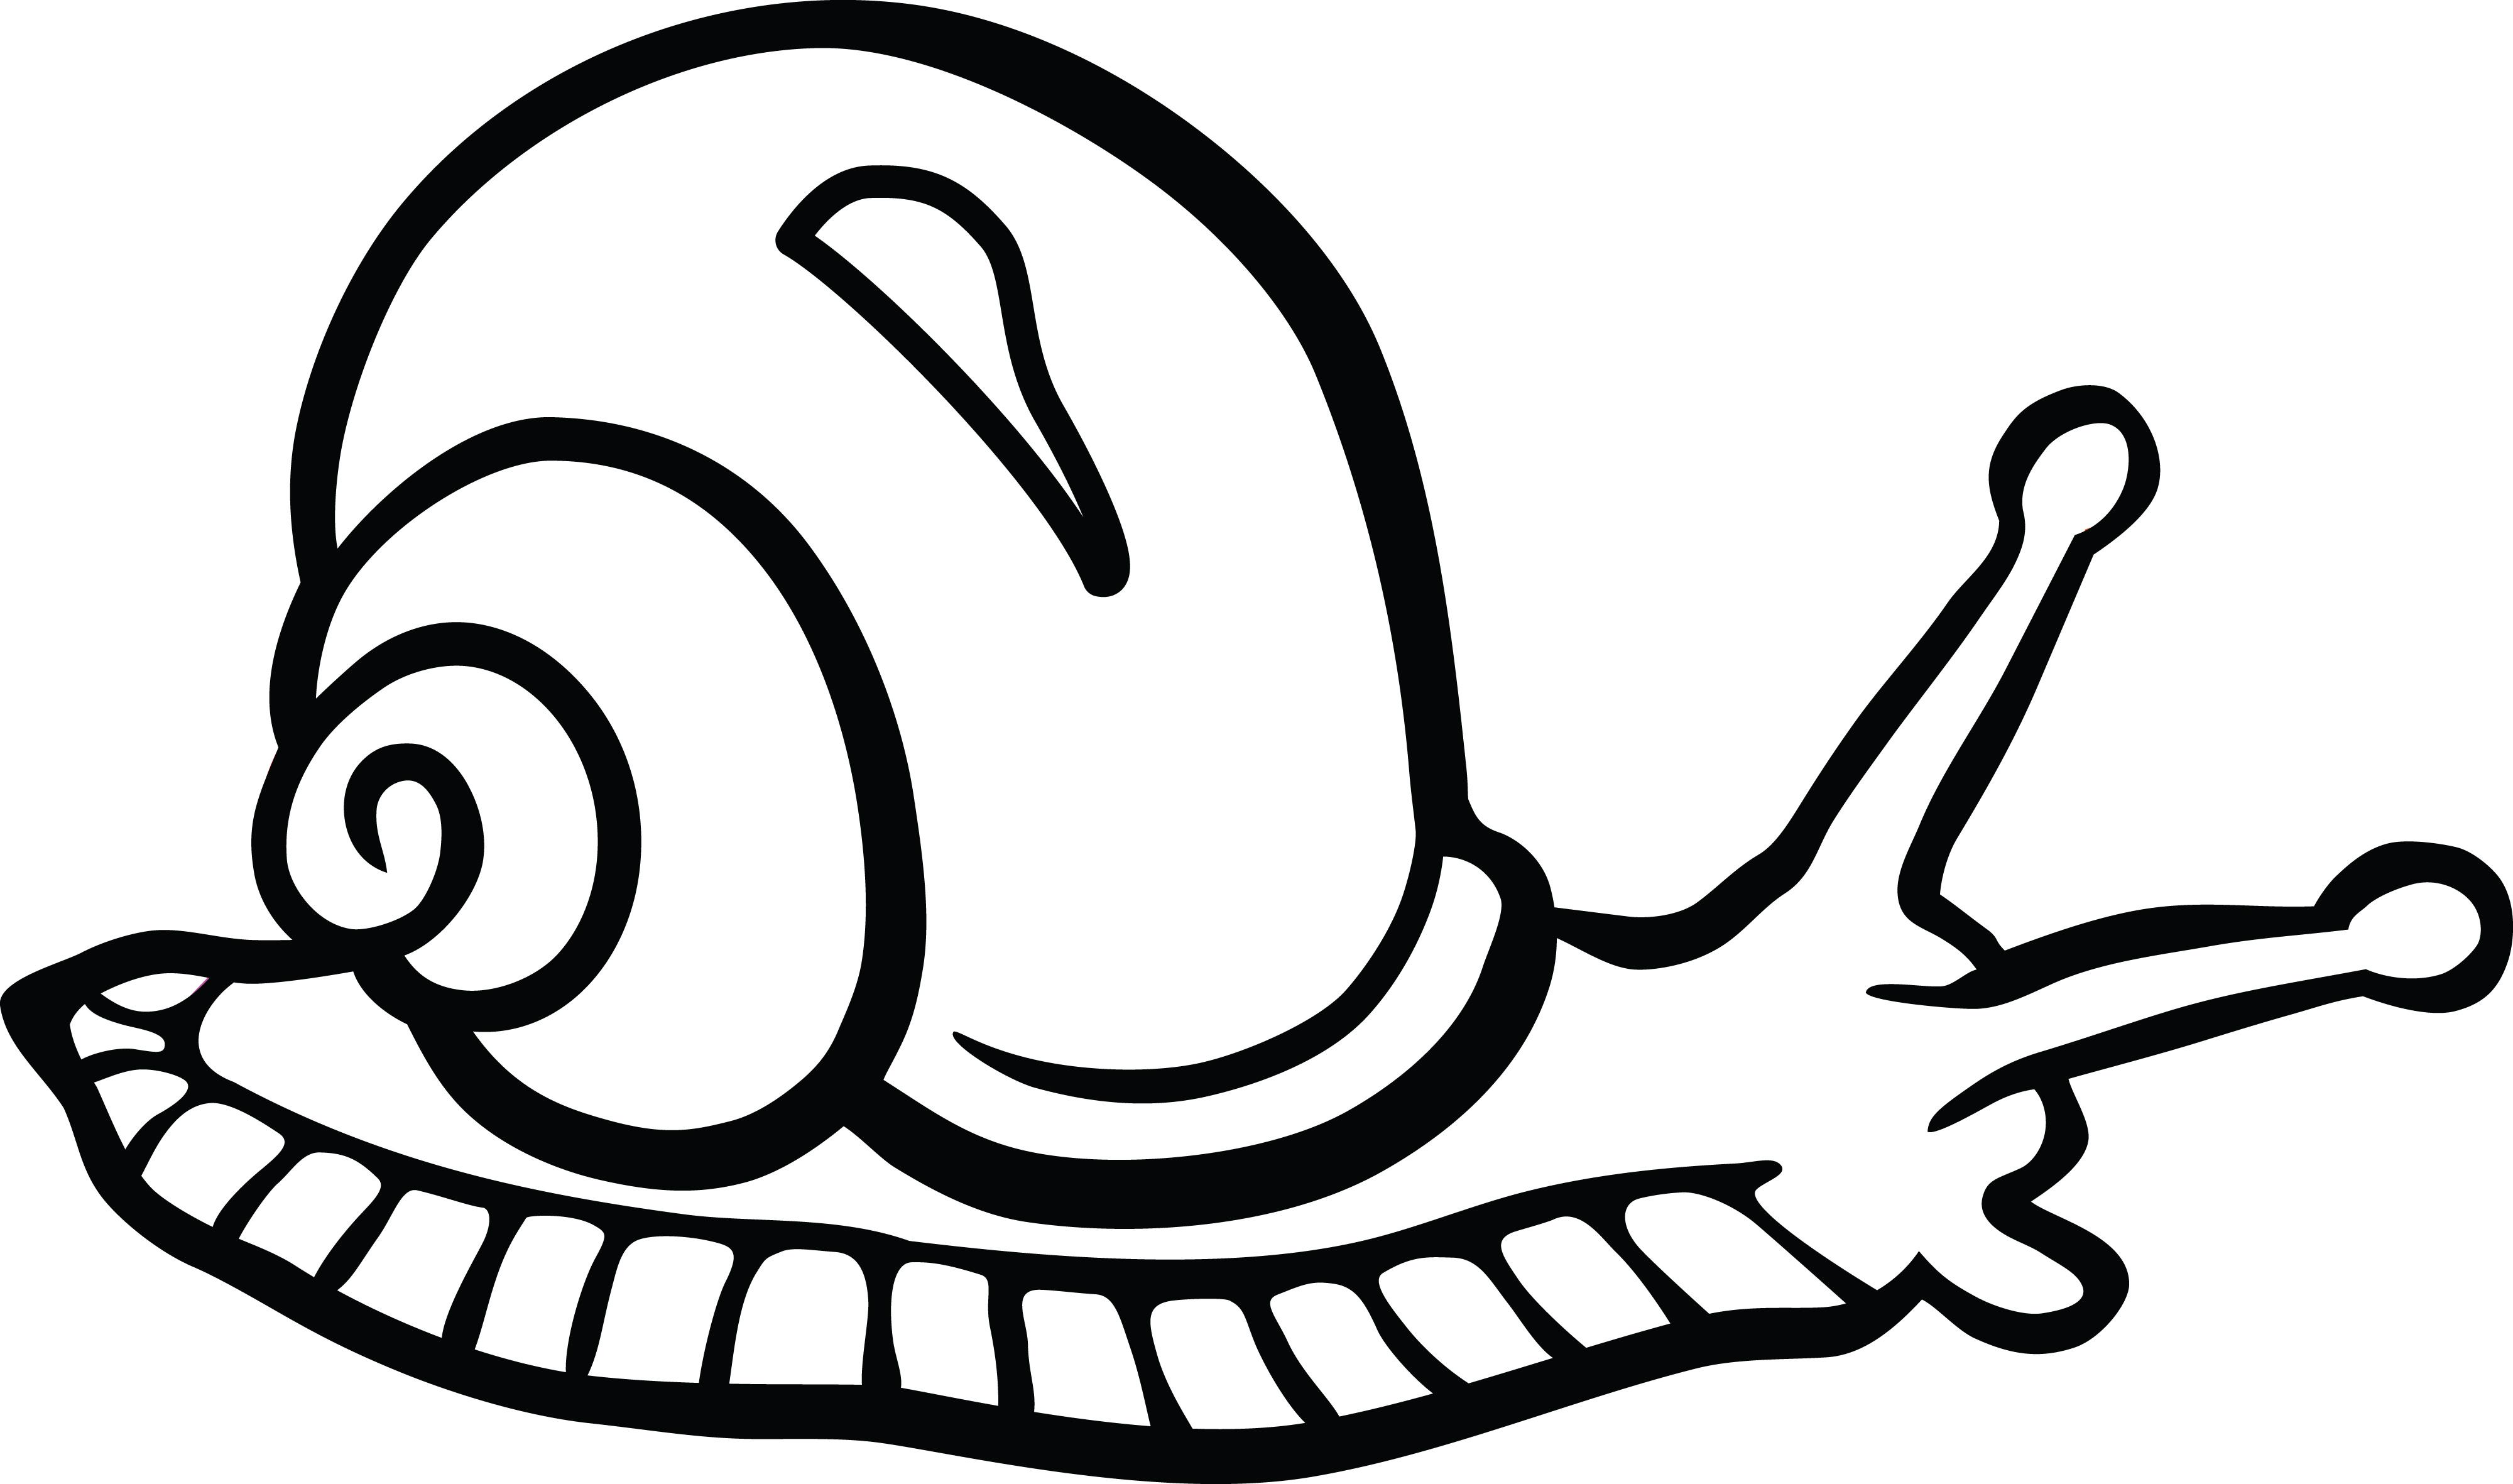 free clipart of a snail rh free clipartof com snail images clipart snail clip art free